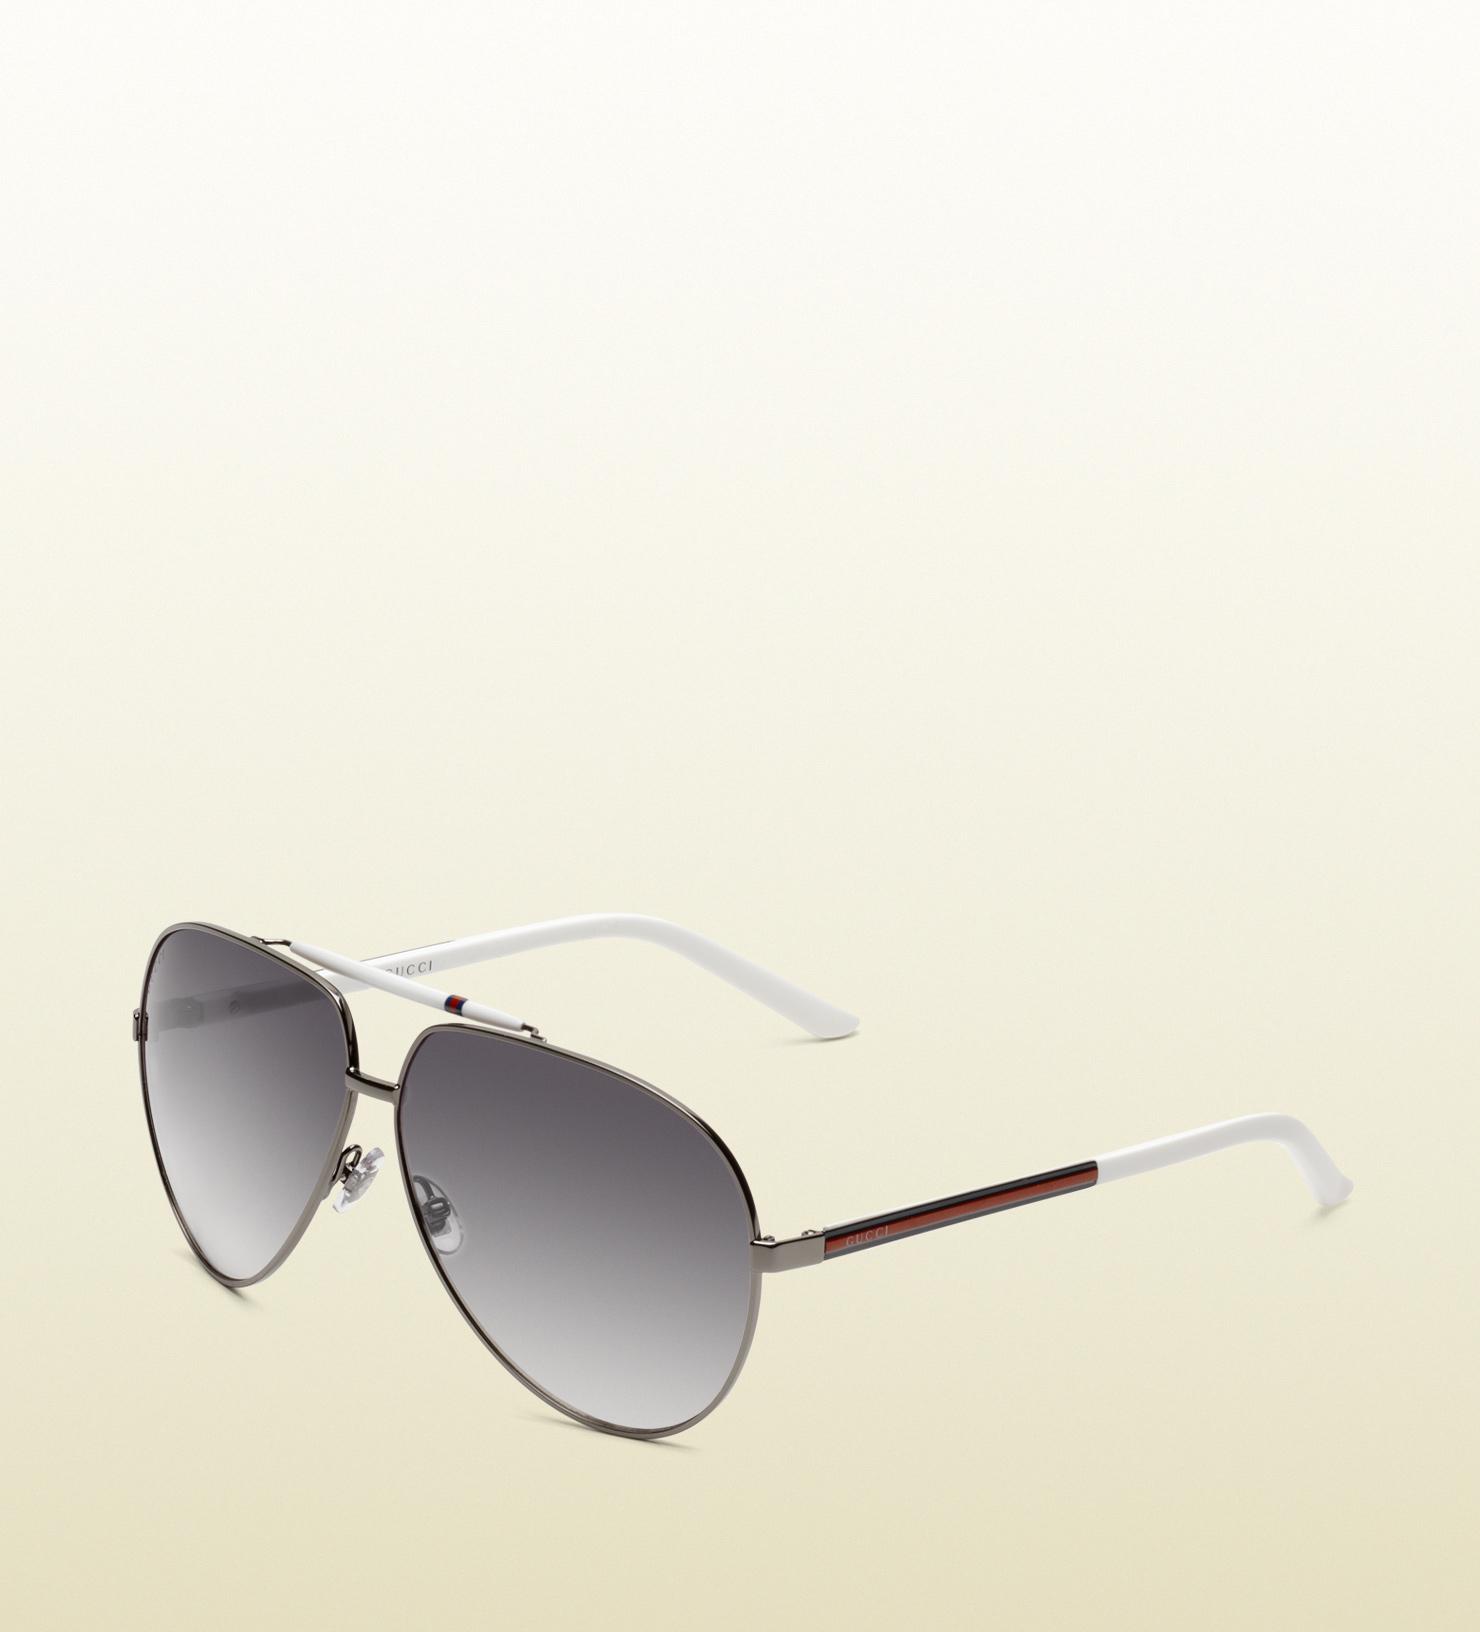 874b7d088d5 Lyst - Gucci Medium Aviator Sunglasses With Signature Web Detail On ...